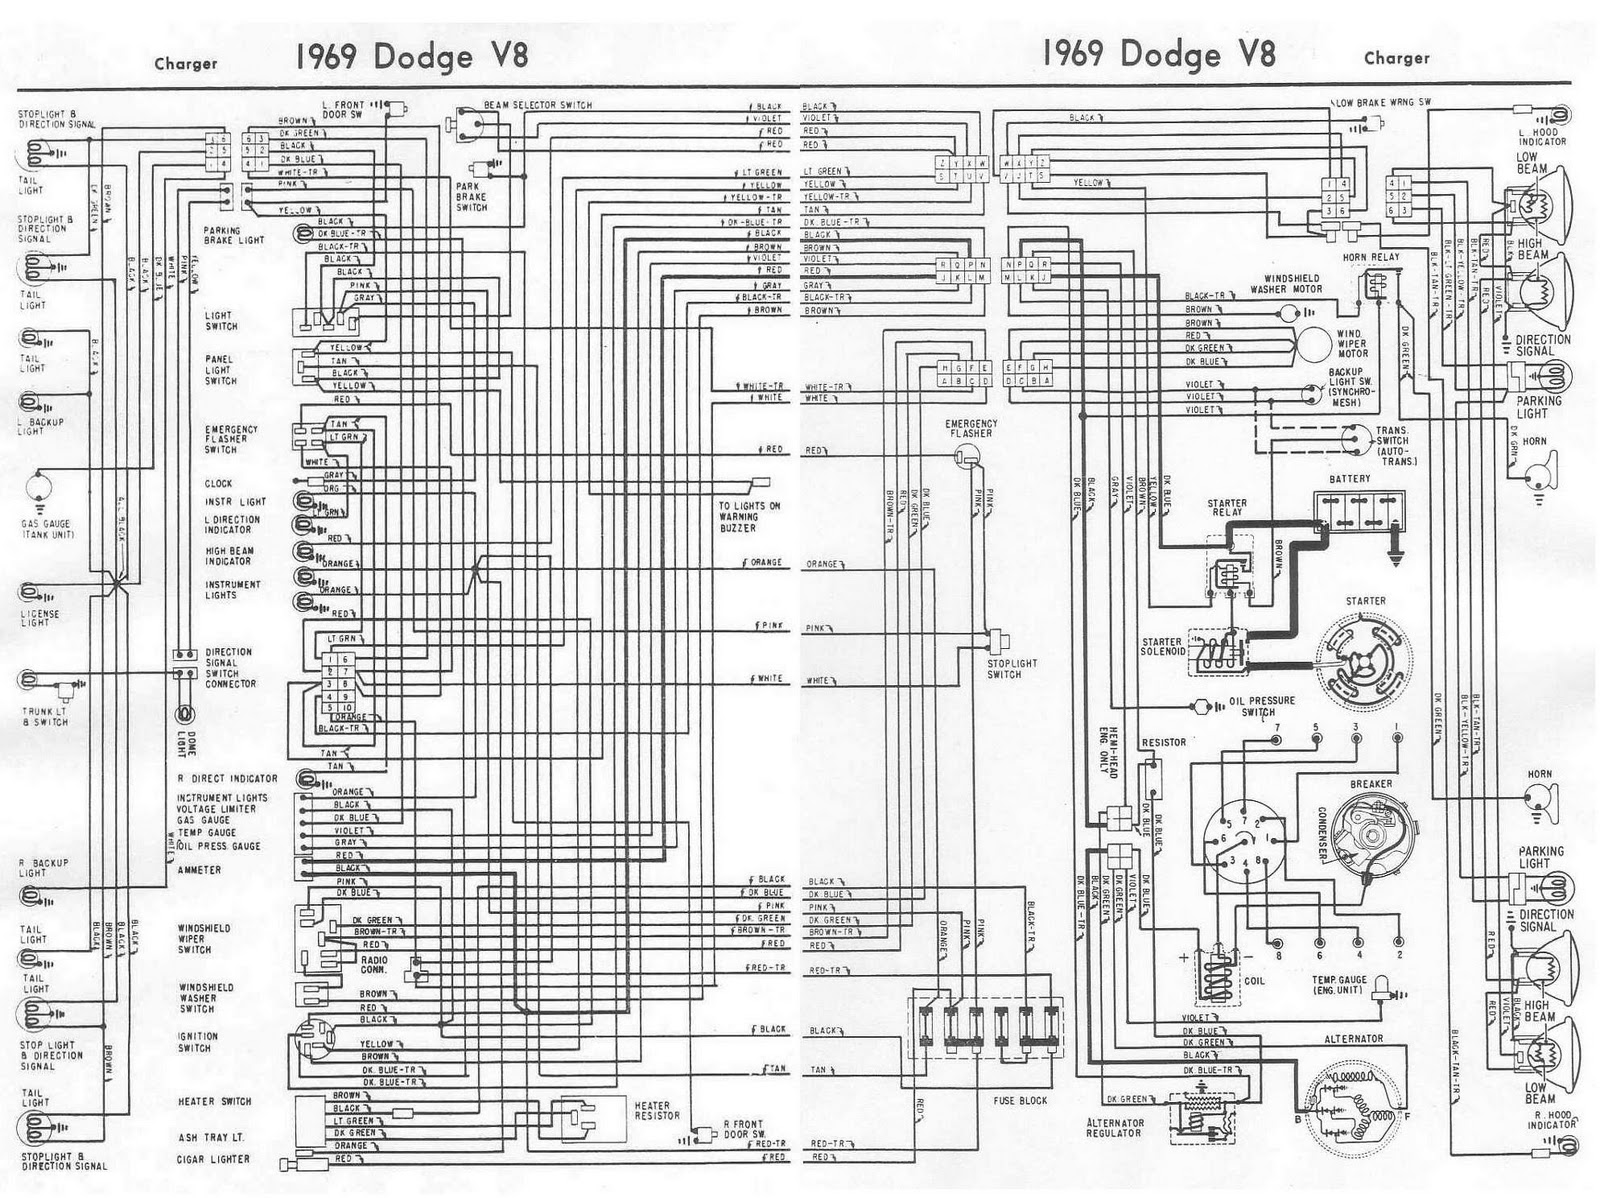 Diagram 2006 Dodge Wiring Diagram Full Version Hd Quality Wiring Diagram Ritualdiagrams Politopendays It